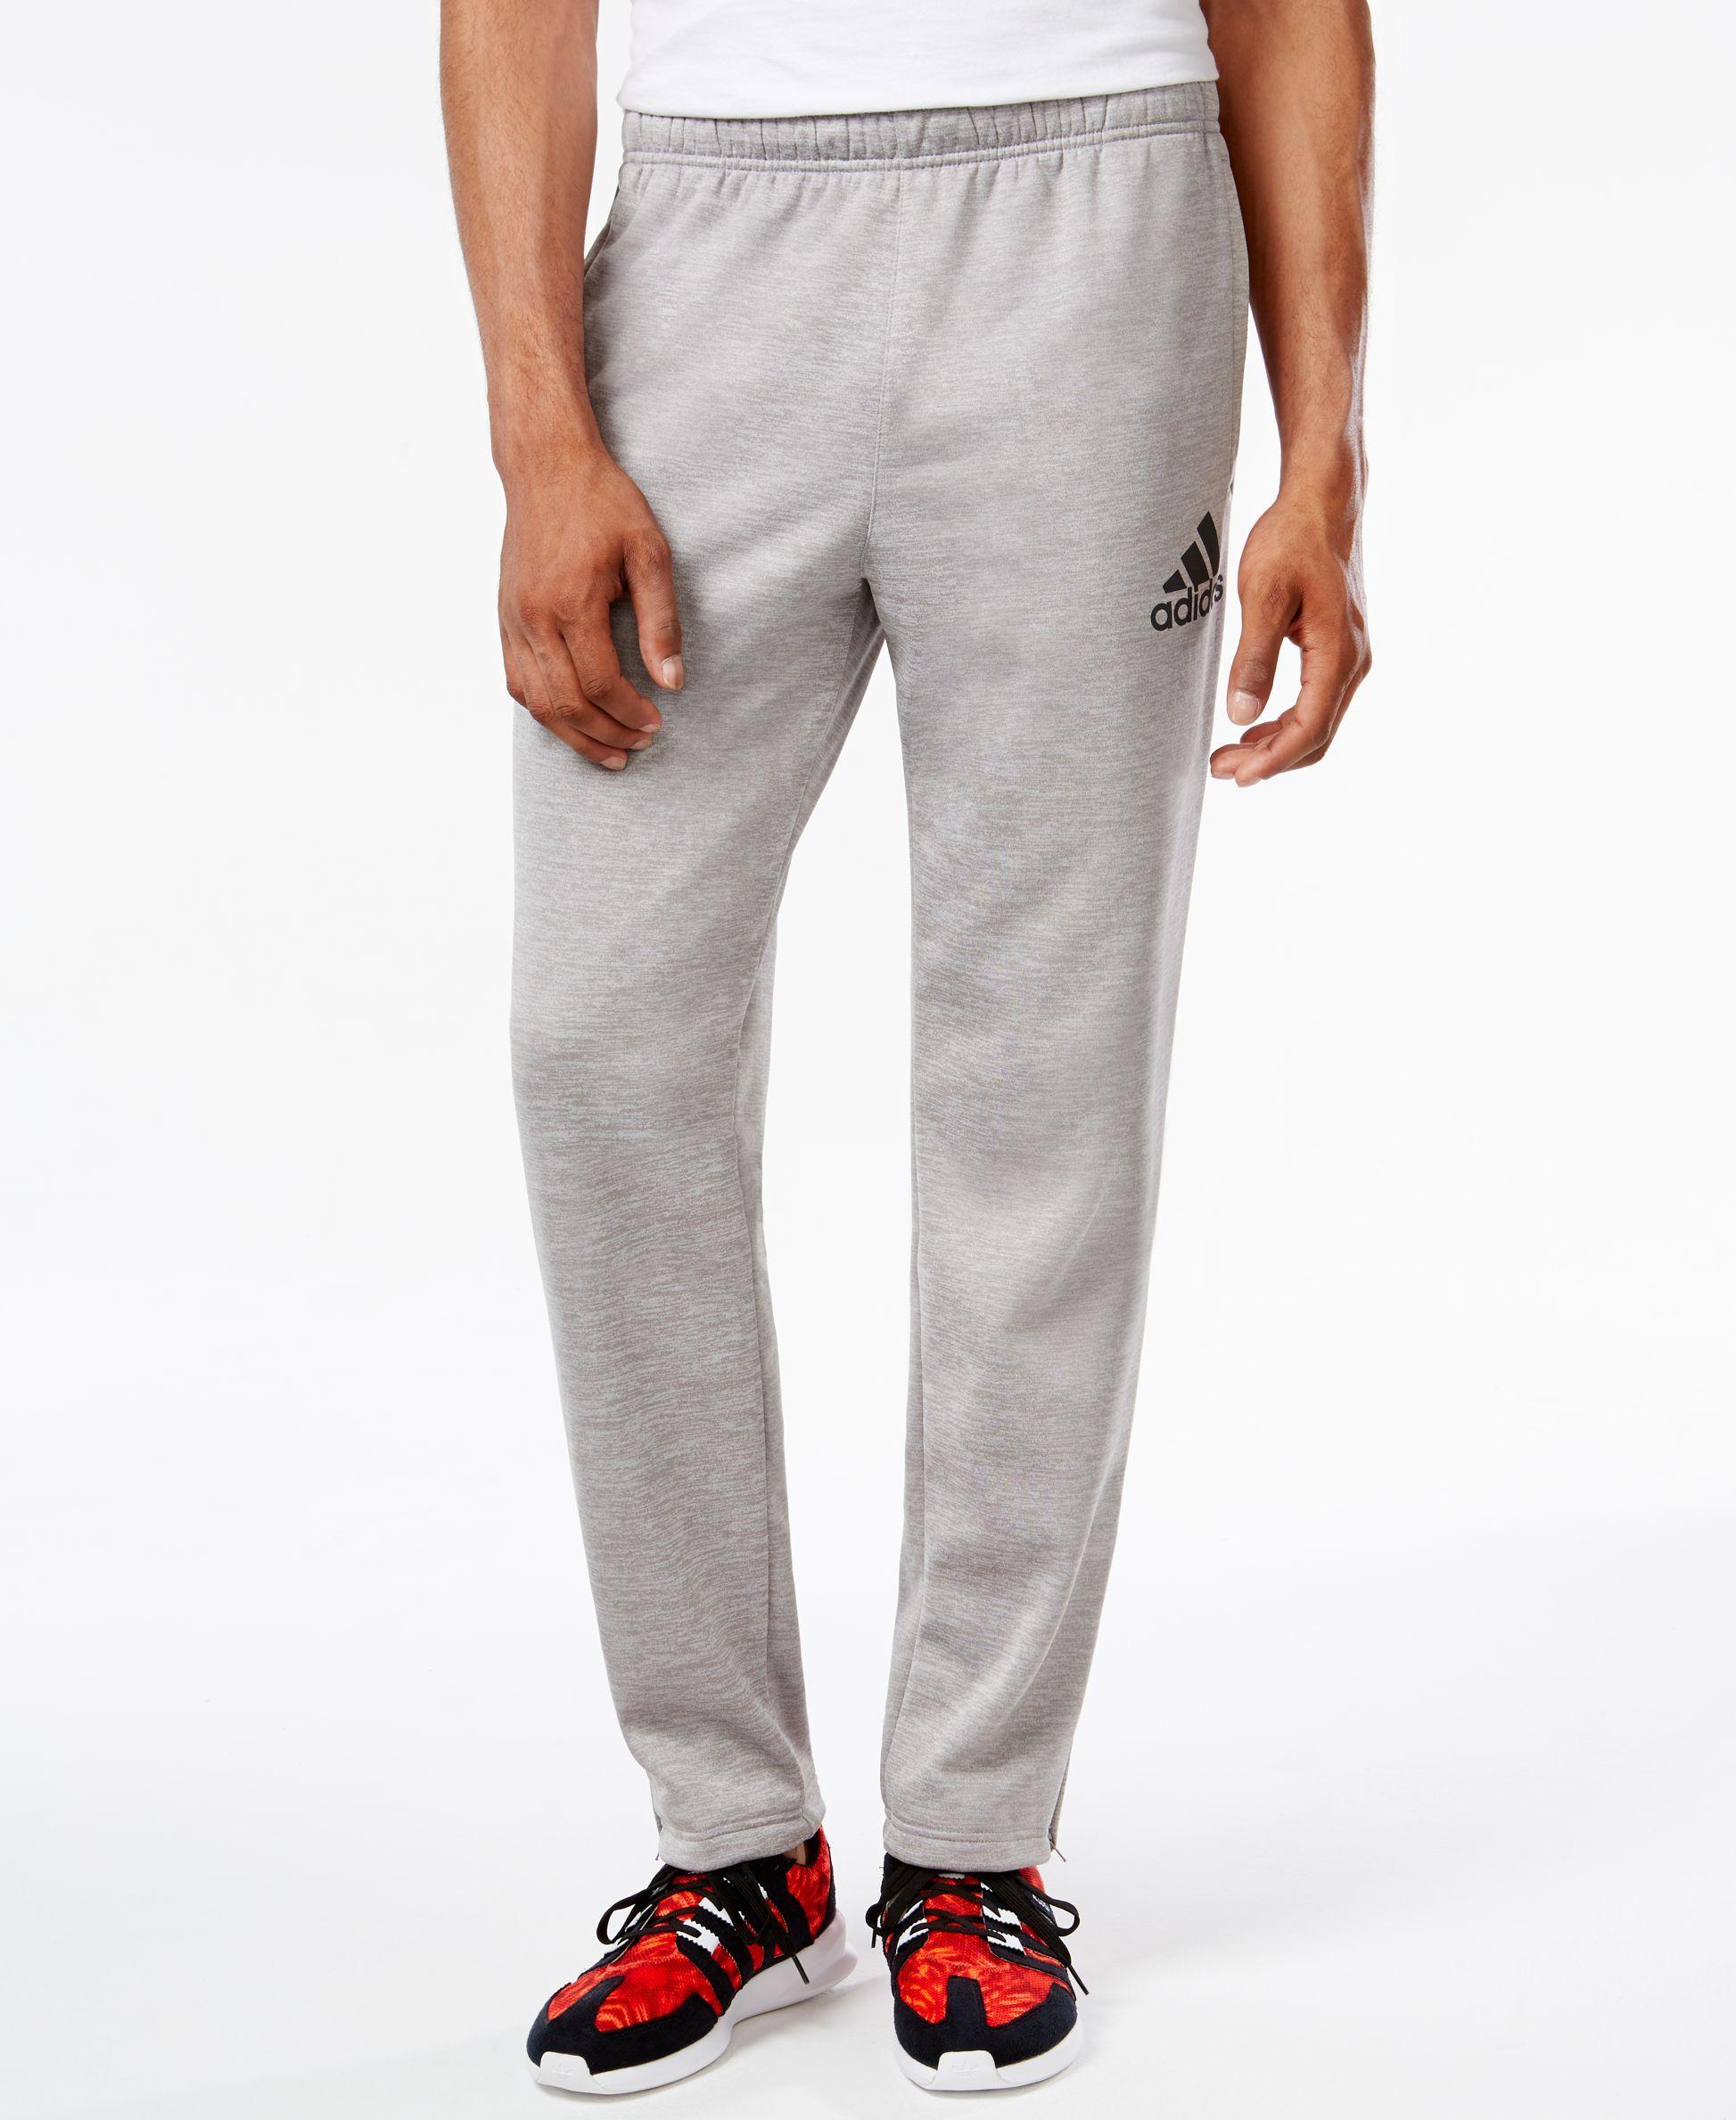 adidas Climawarm Tech Fleece Sweatpants